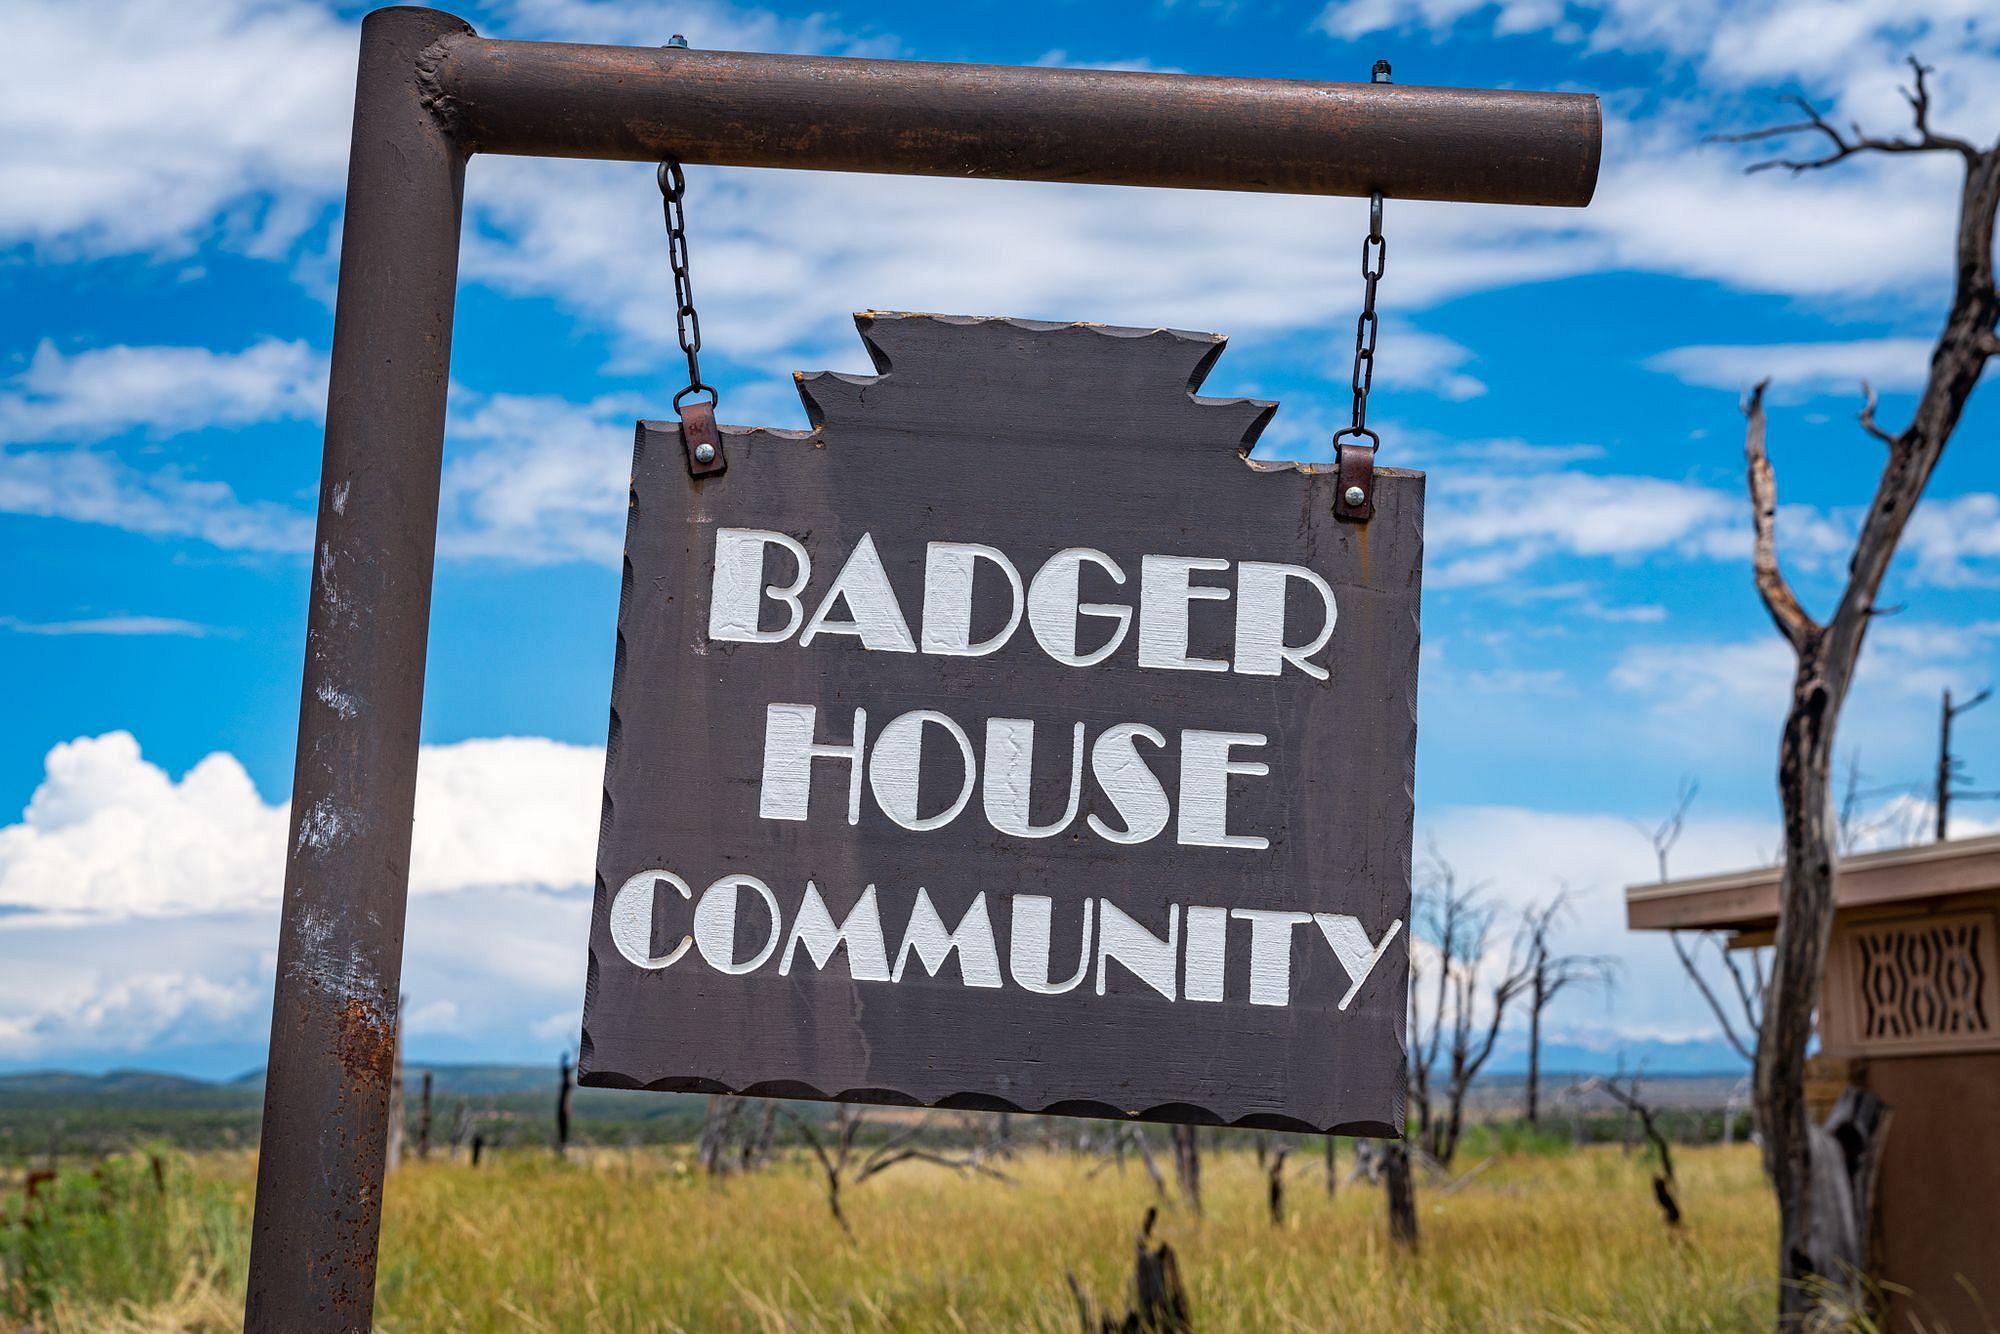 Badger House Community